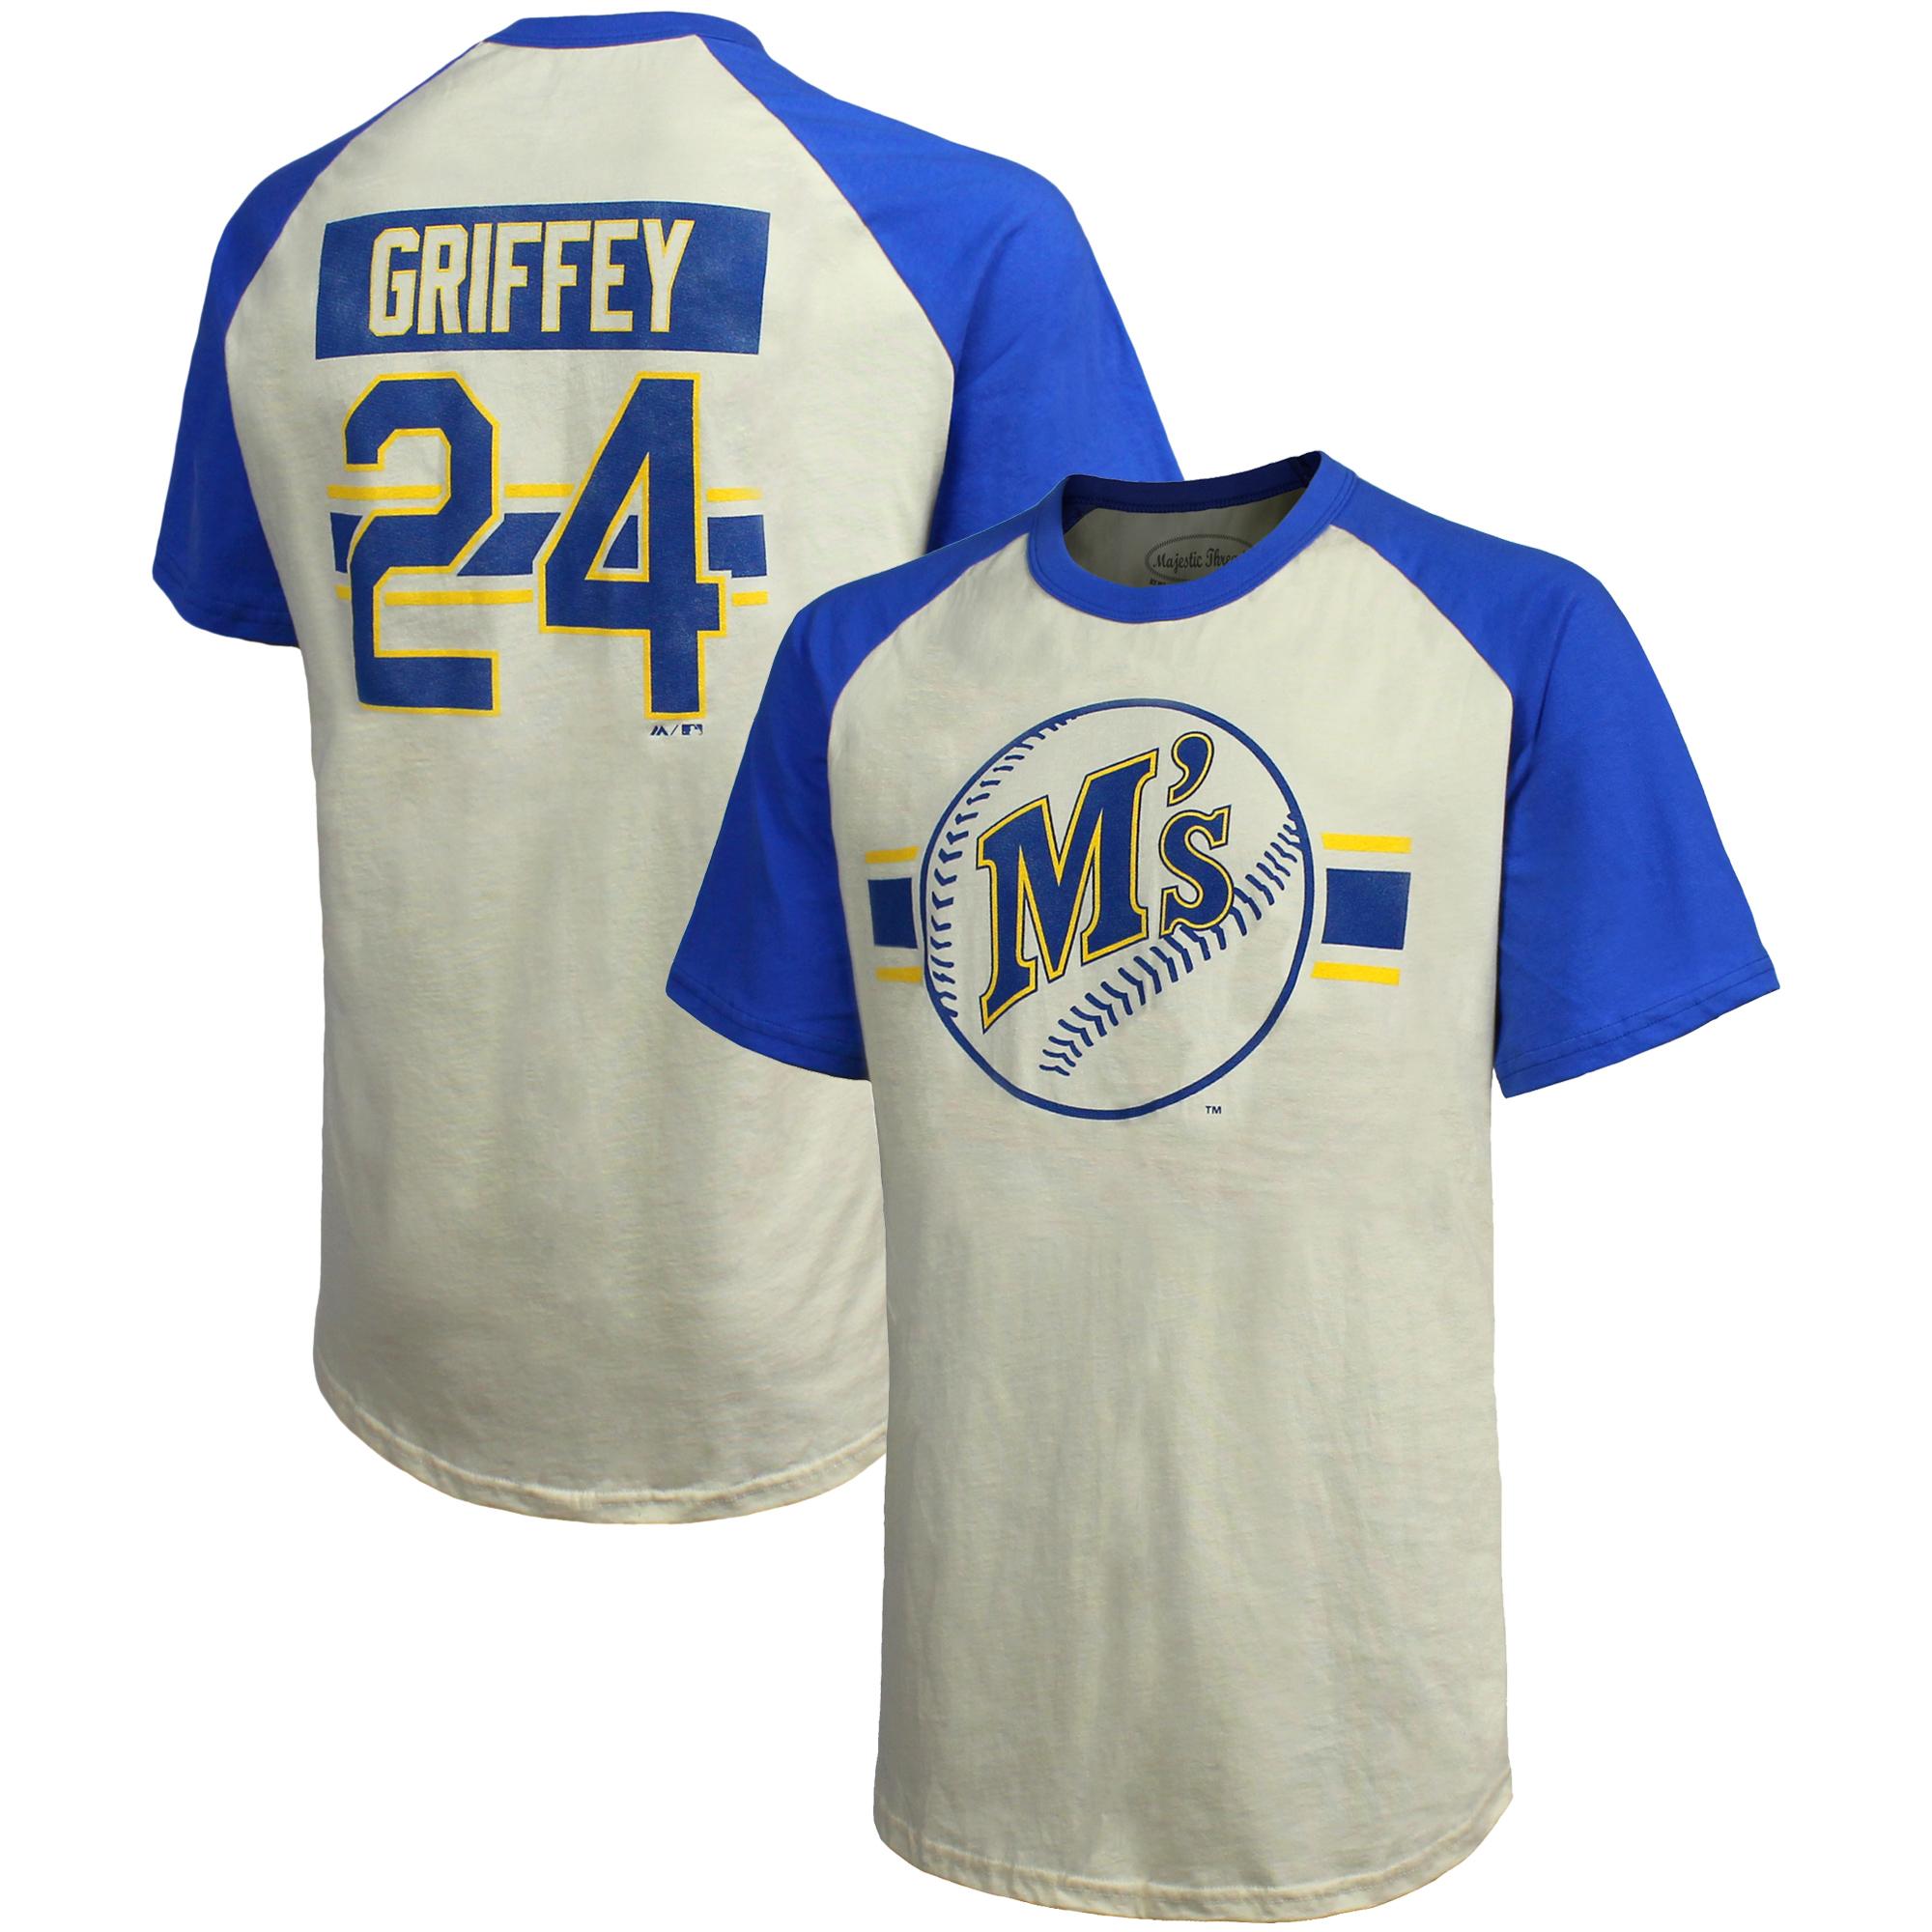 Ken Griffey Jr. Seattle Mariners Majestic Threads Cooperstown Collection Hard Hit Player Name & Number Raglan T-Shirt - Cream/Royal